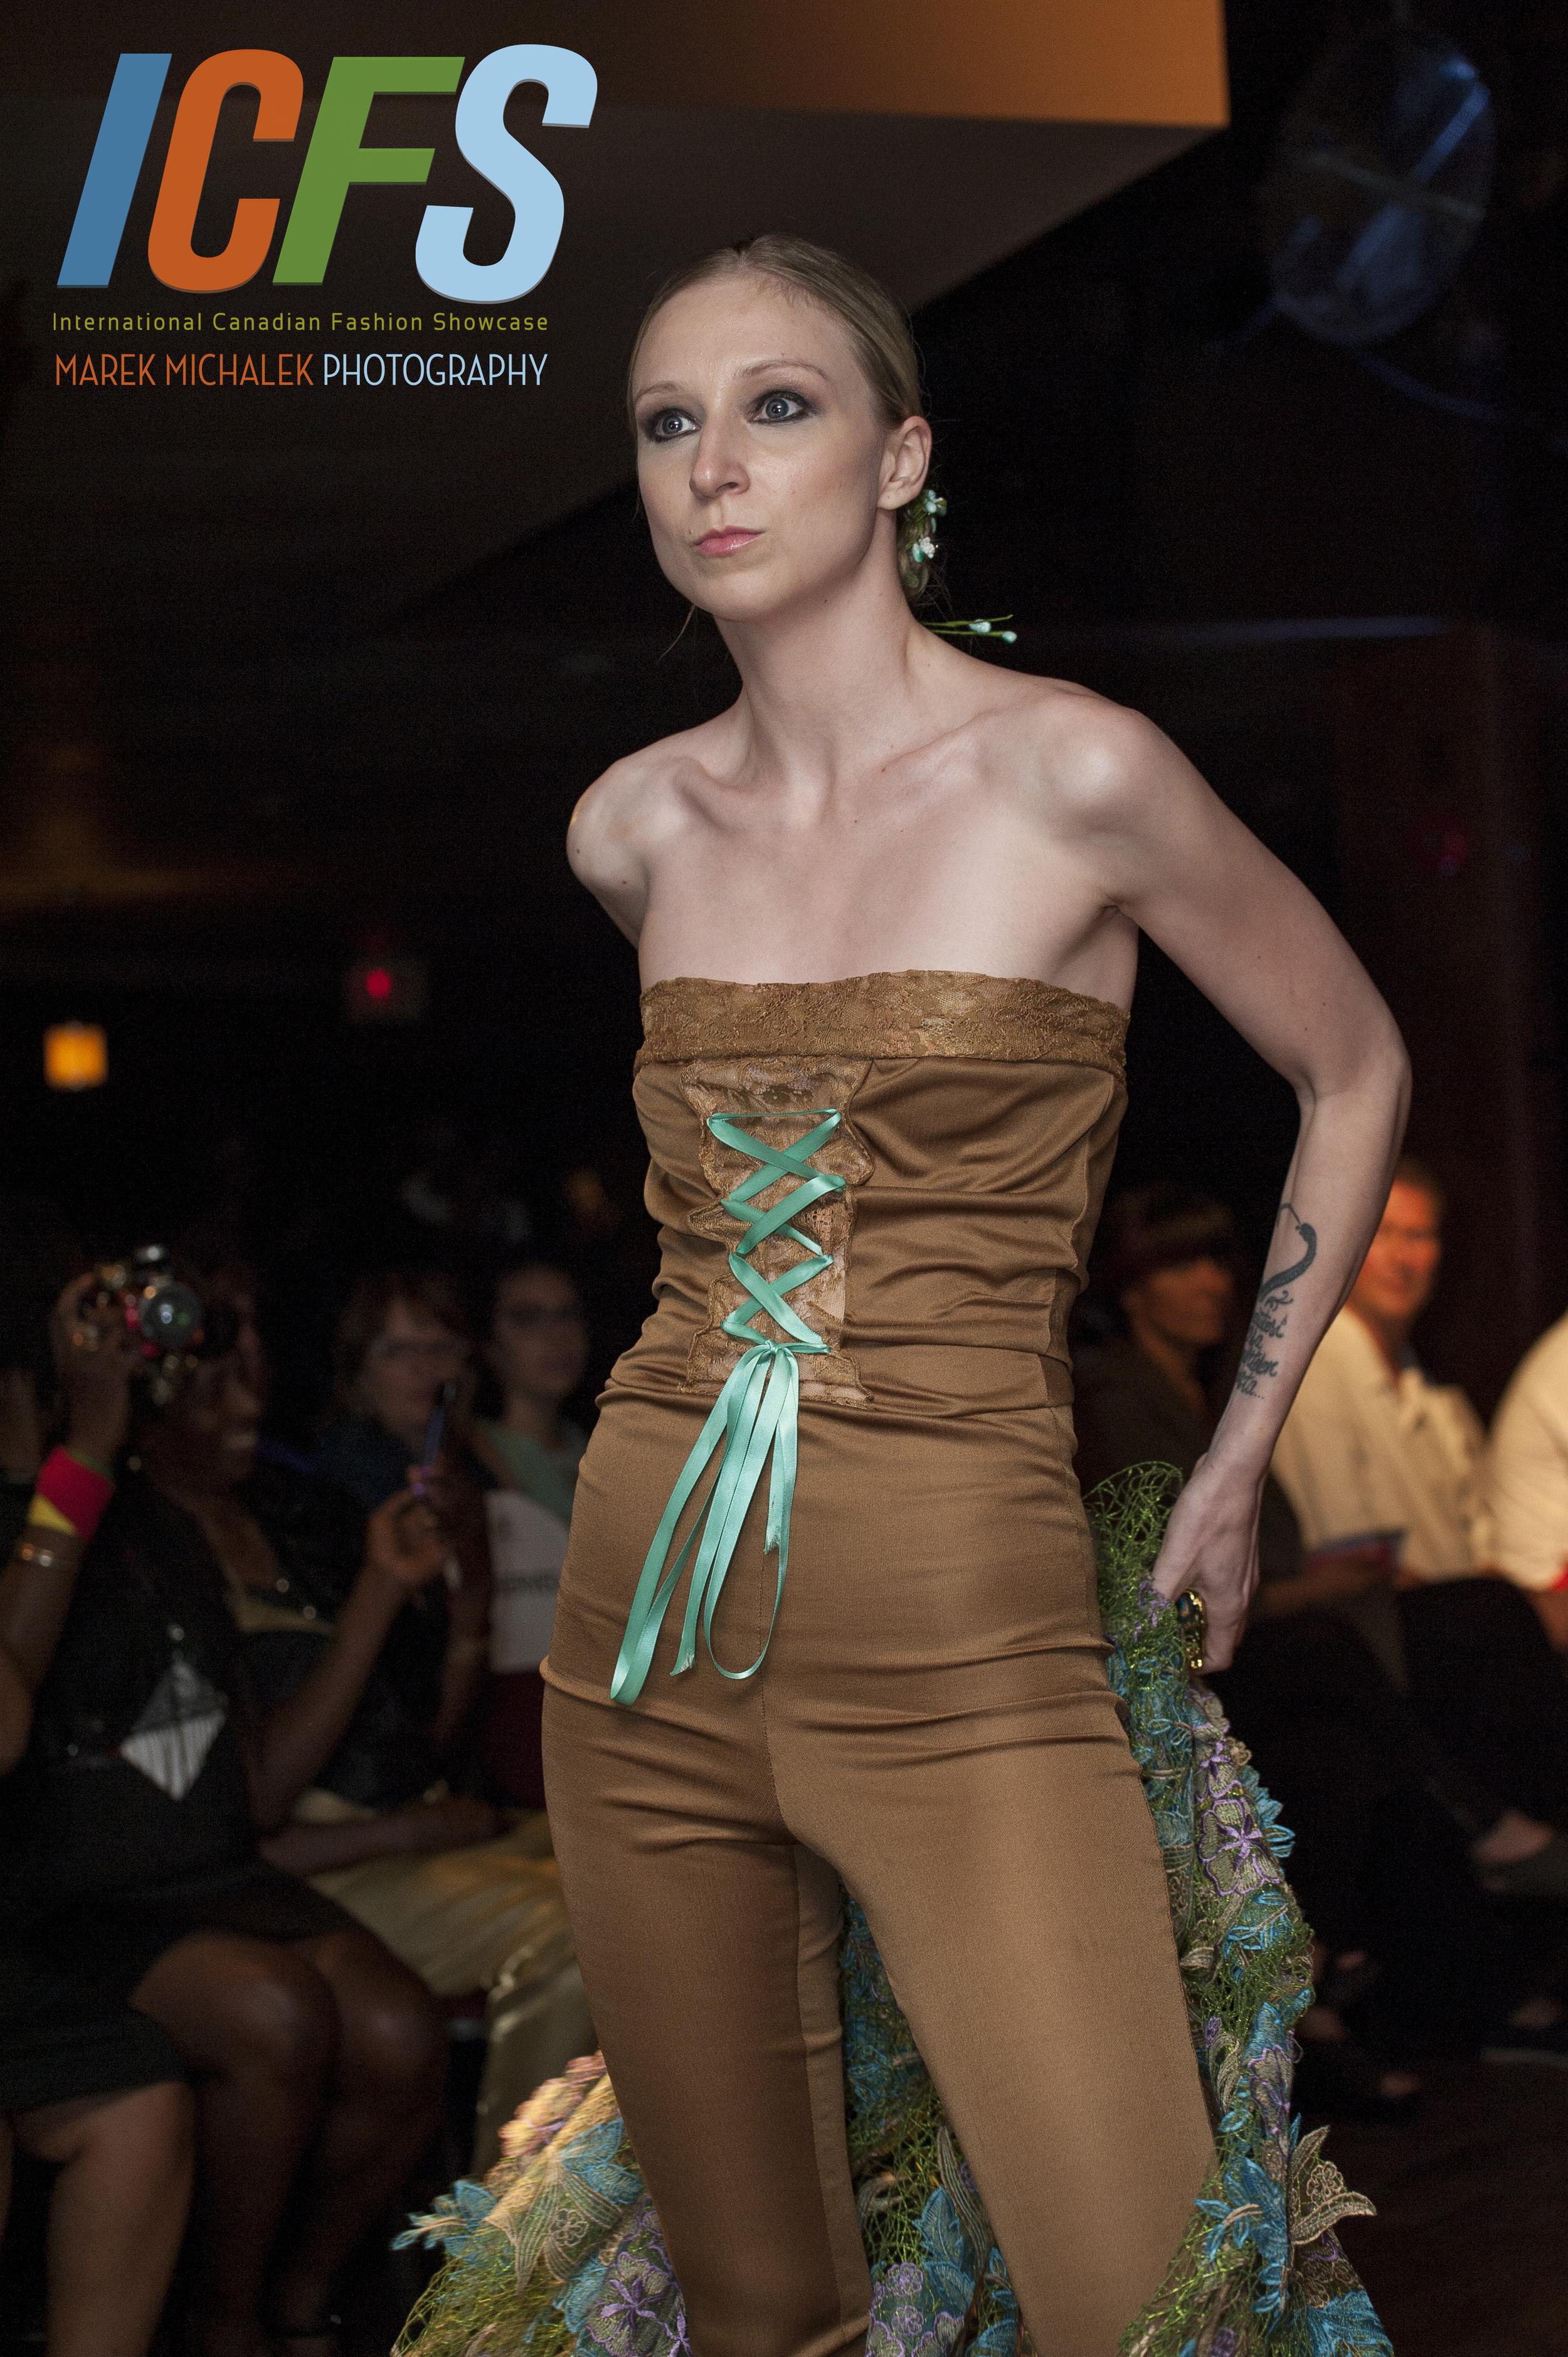 International Canadian Fashion Showcase - Marek Michalek_1 copy.jpg